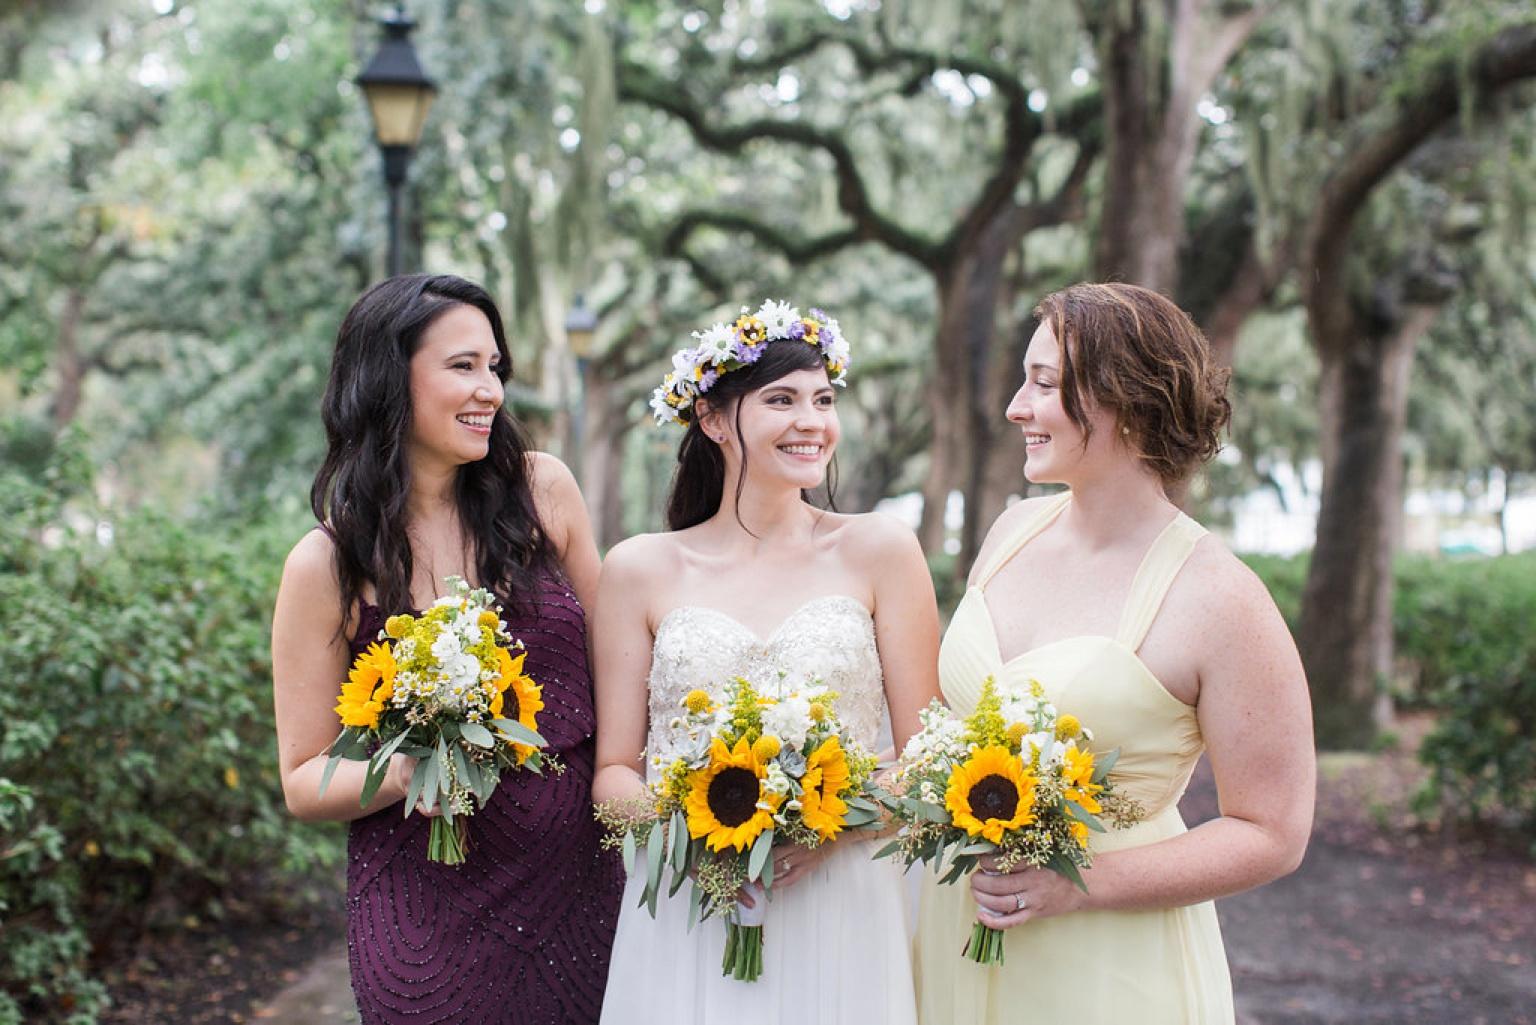 Apt_B_Photo_Savannah_Wedding_Photographer_Flower_Crown040.JPG